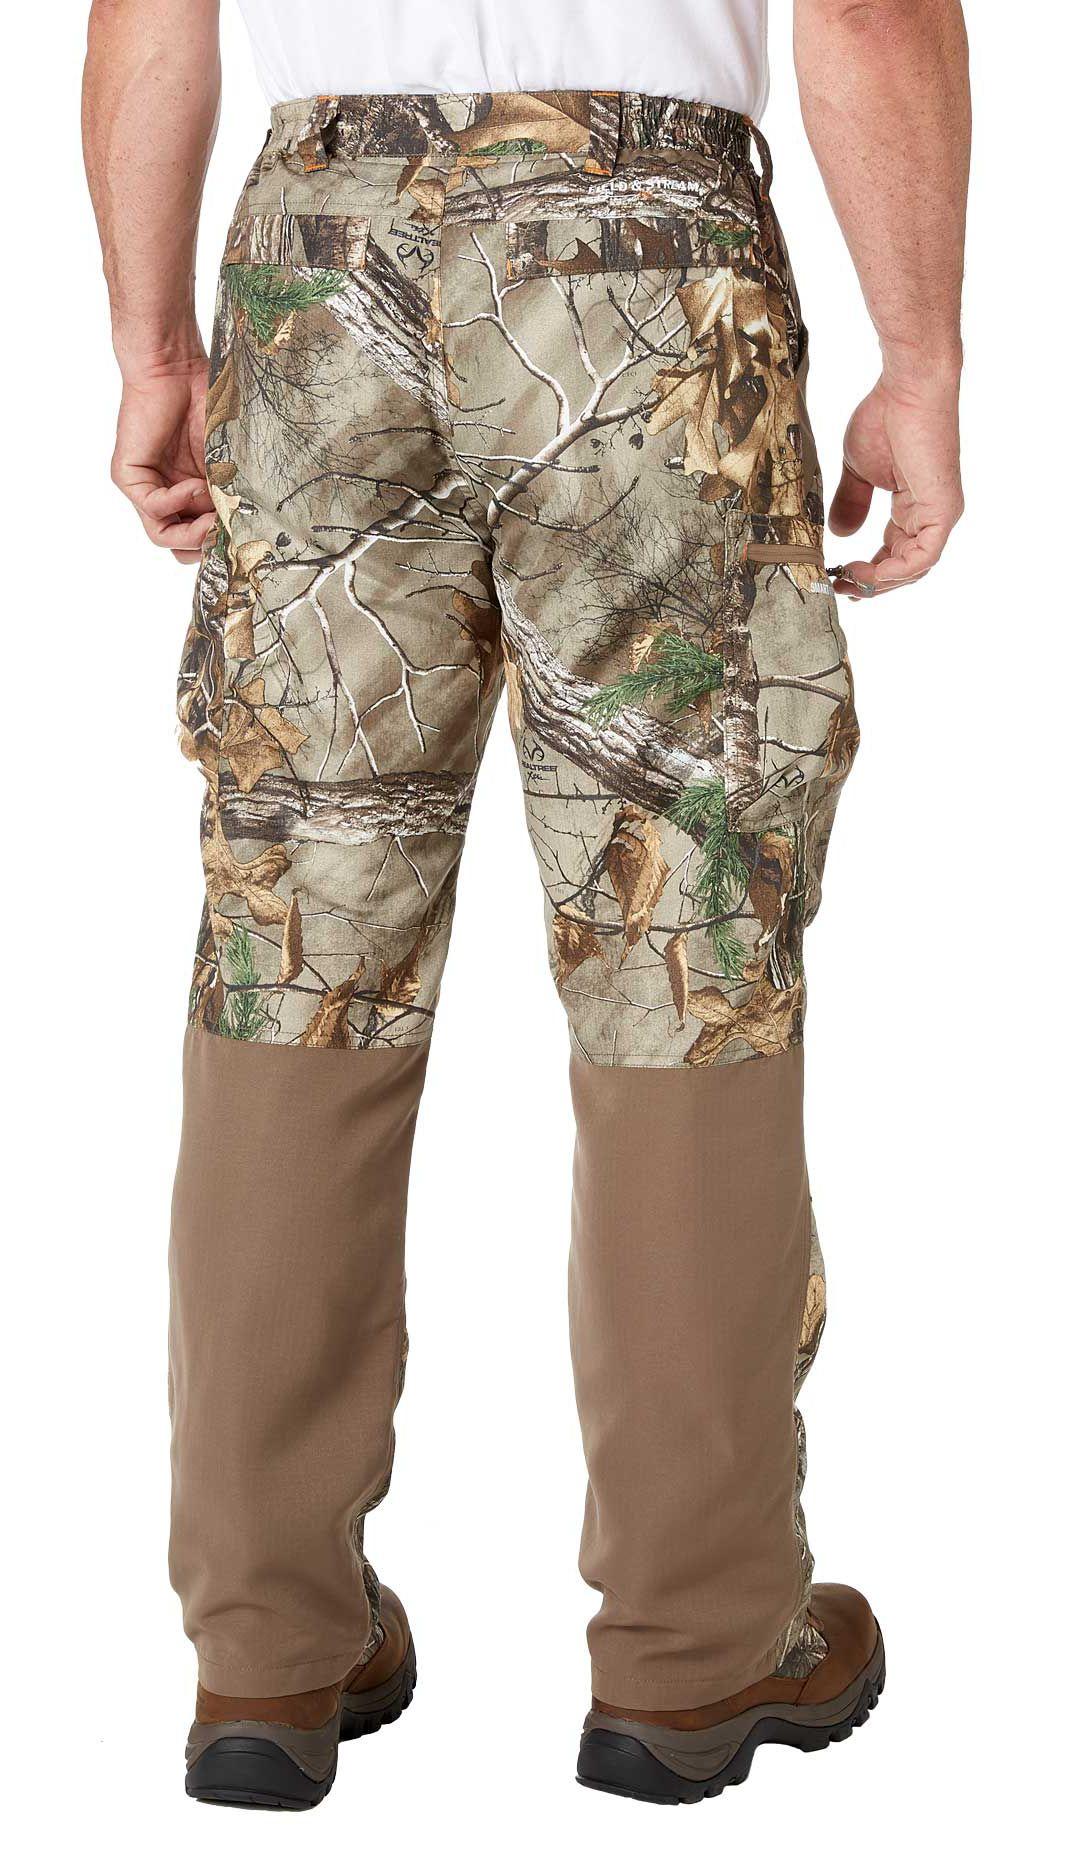 98151a9015 Field & Stream Men's Every Hunt Lightweight Cargo Hunting Pants ...